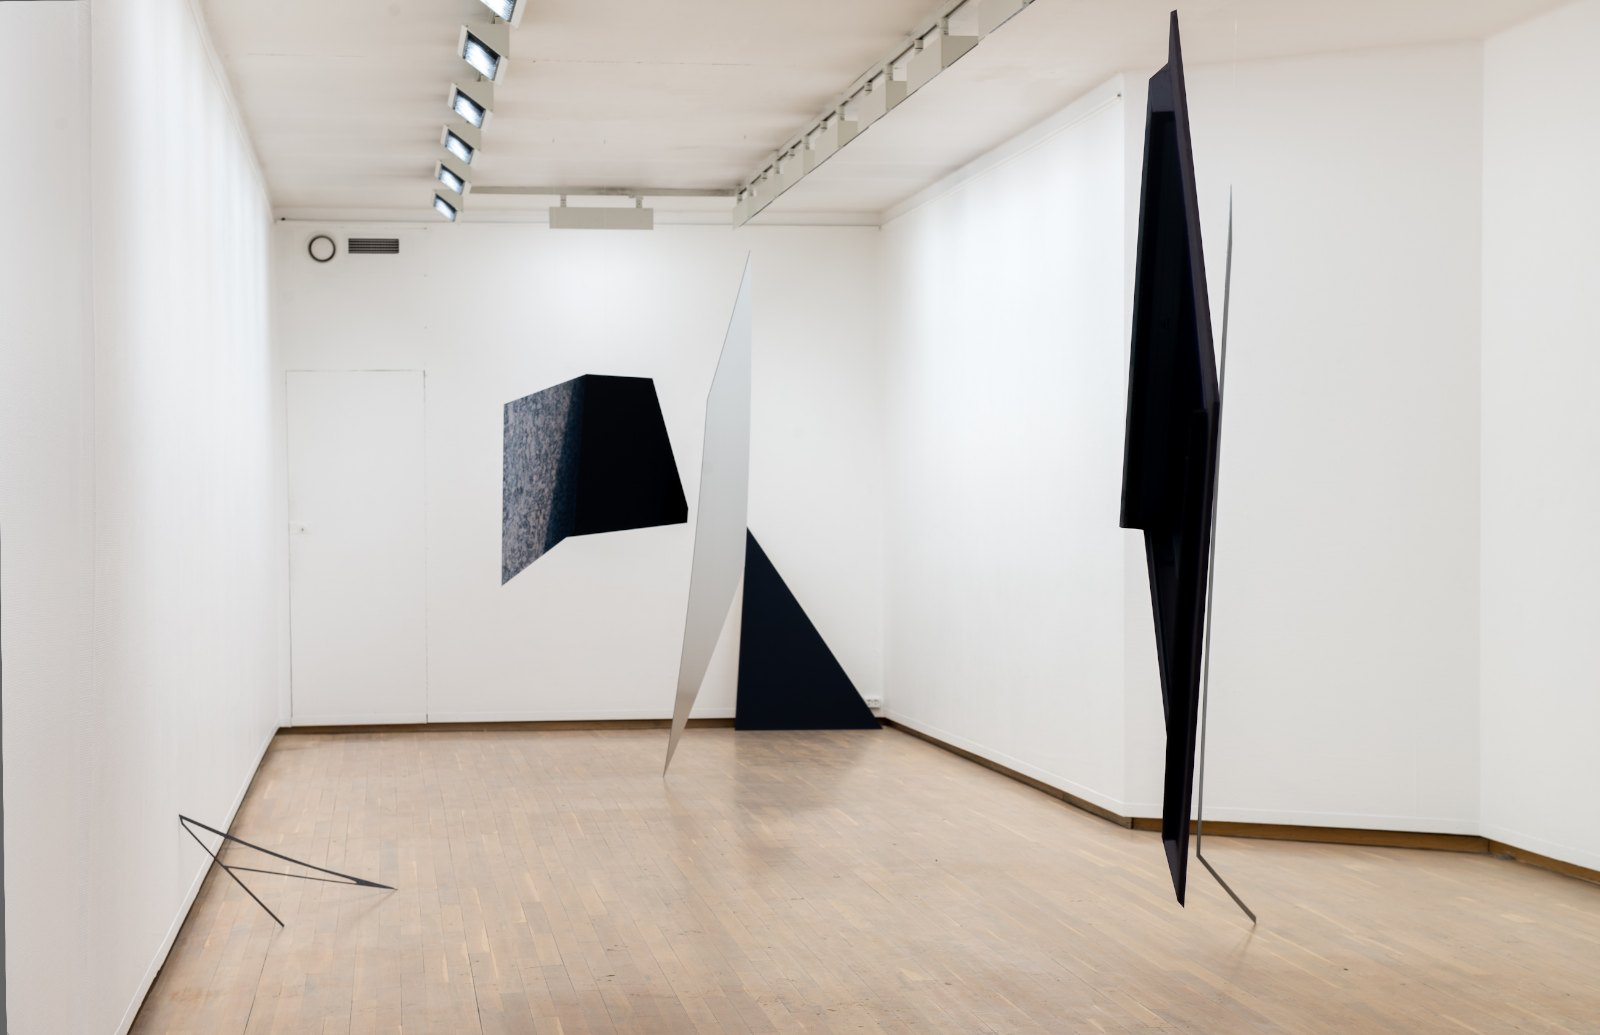 Installation view, Marie Buskov 'Window, Figures, Leaves', Kunstnerforbundet, Oslo 2013. Photo: Thomas Tveter